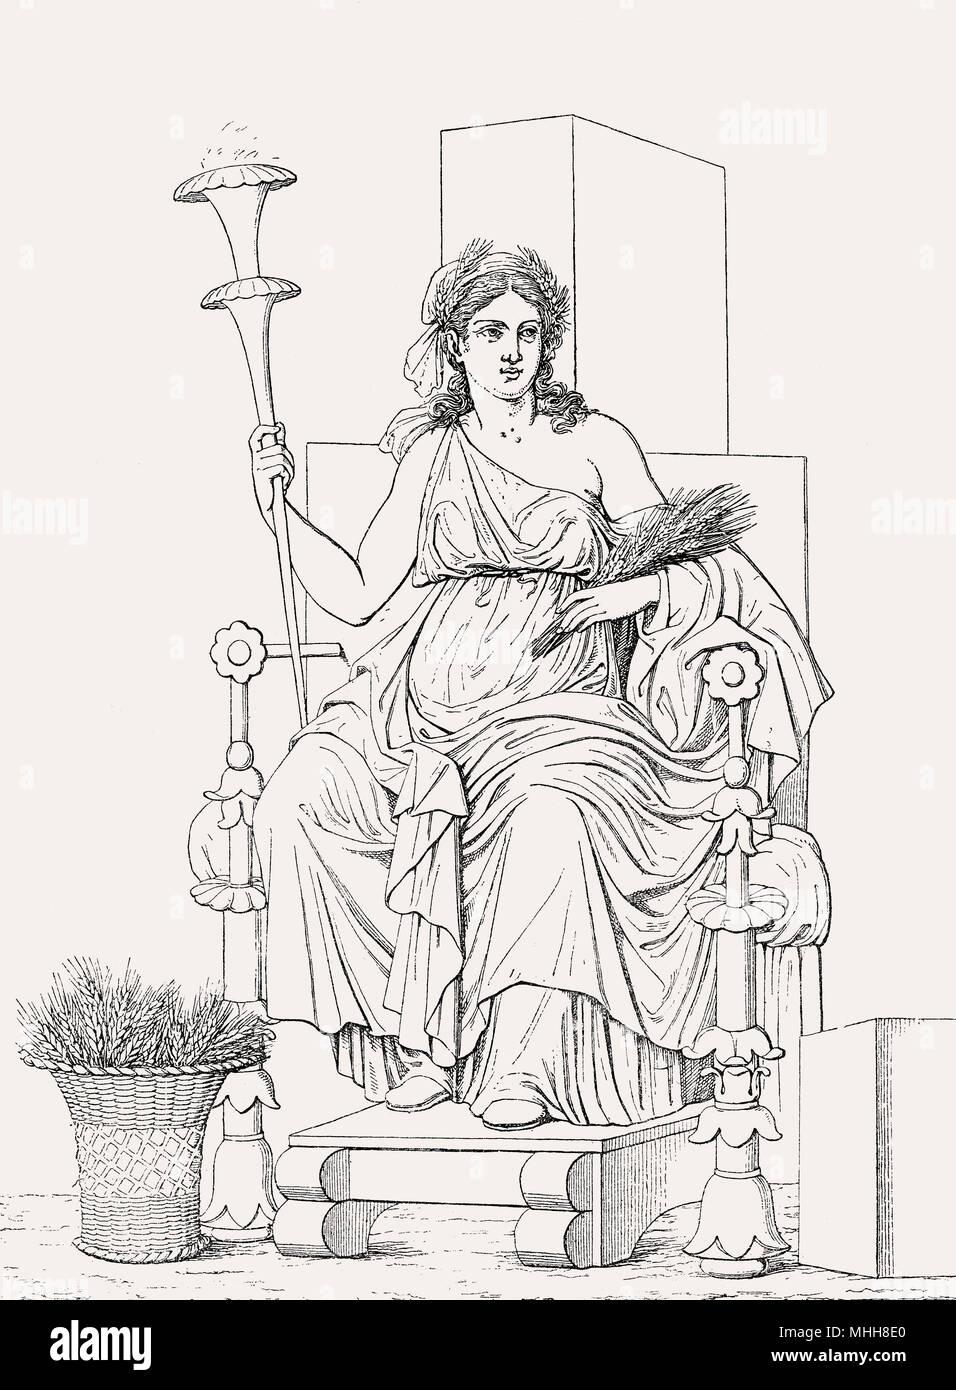 Demeter the goddess of the harvest and agriculture, Greek mythology - Stock Image